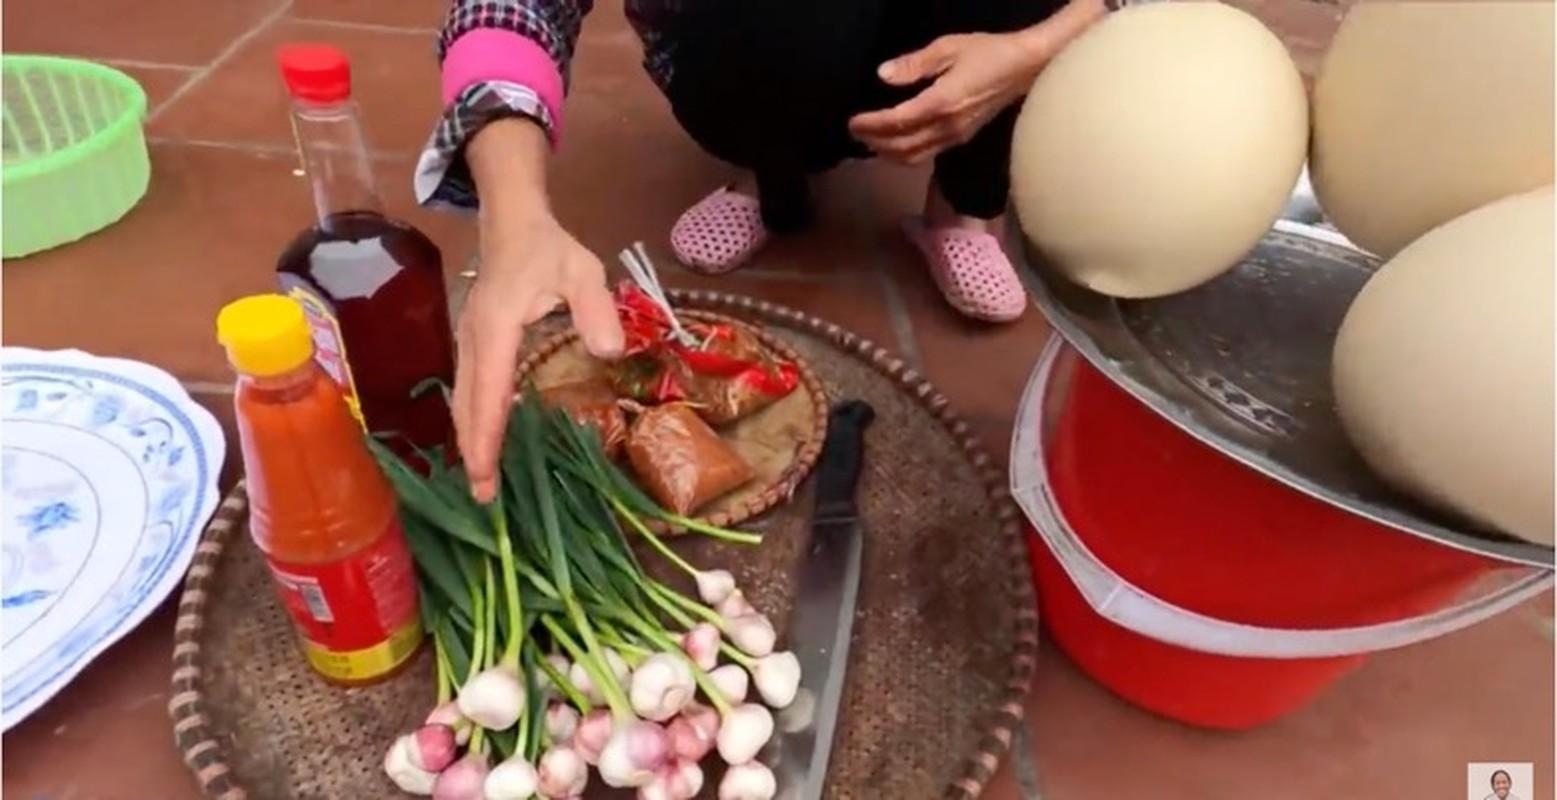 Nau do an co the gay ngo doc, ba Tan Vlog nhan y kien trai chieu-Hinh-2